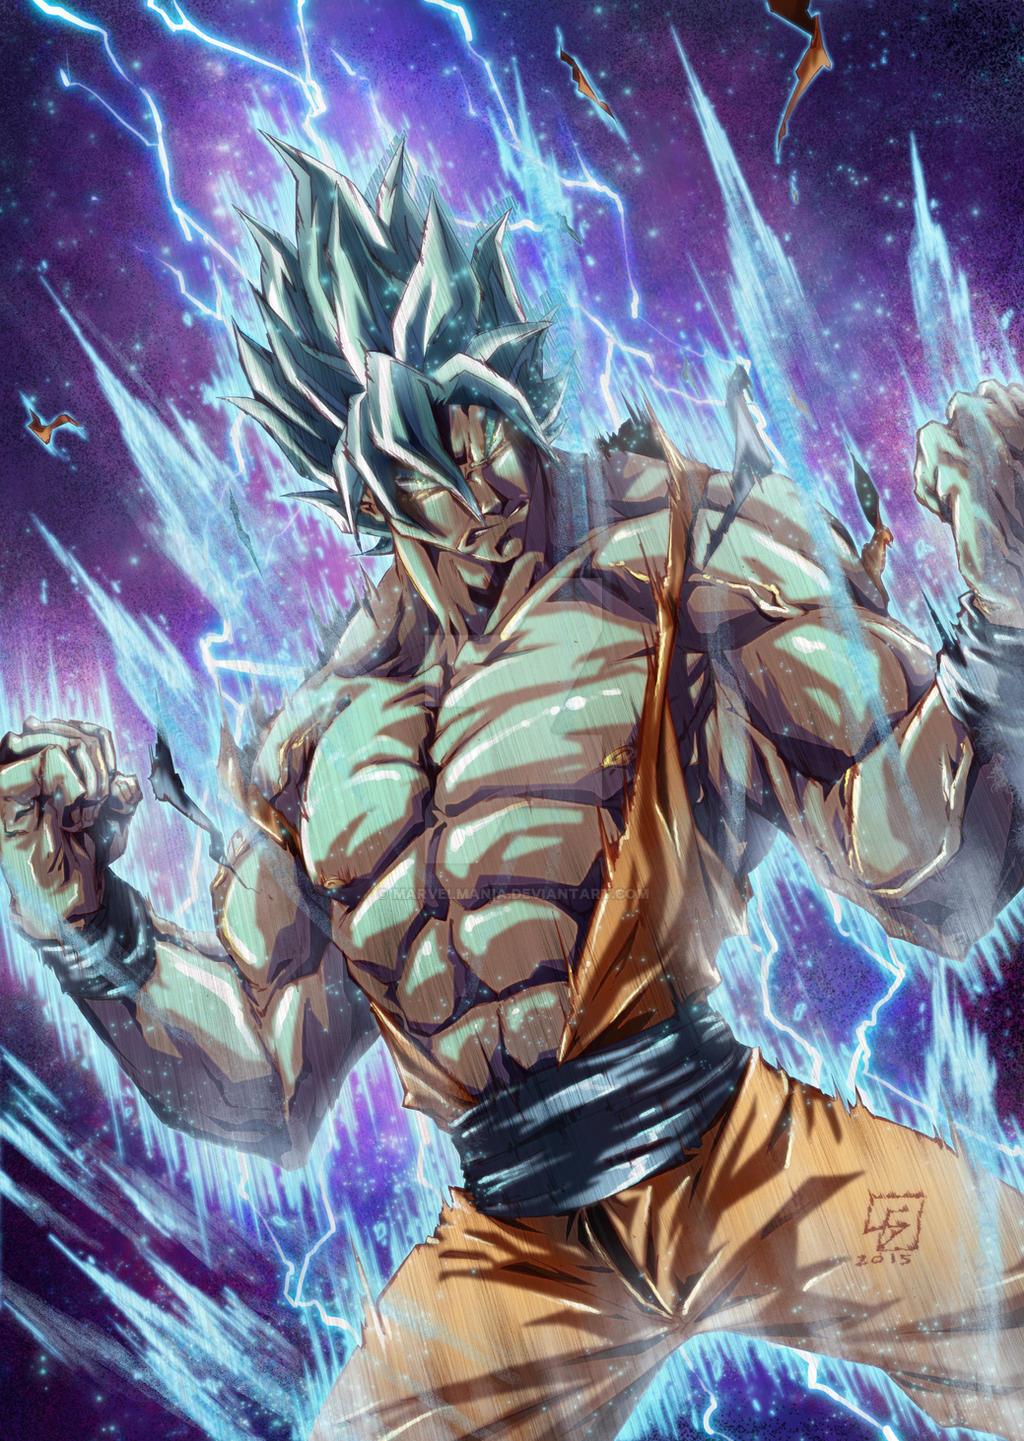 Son Goku God Mode colored by marvelmania on DeviantArt